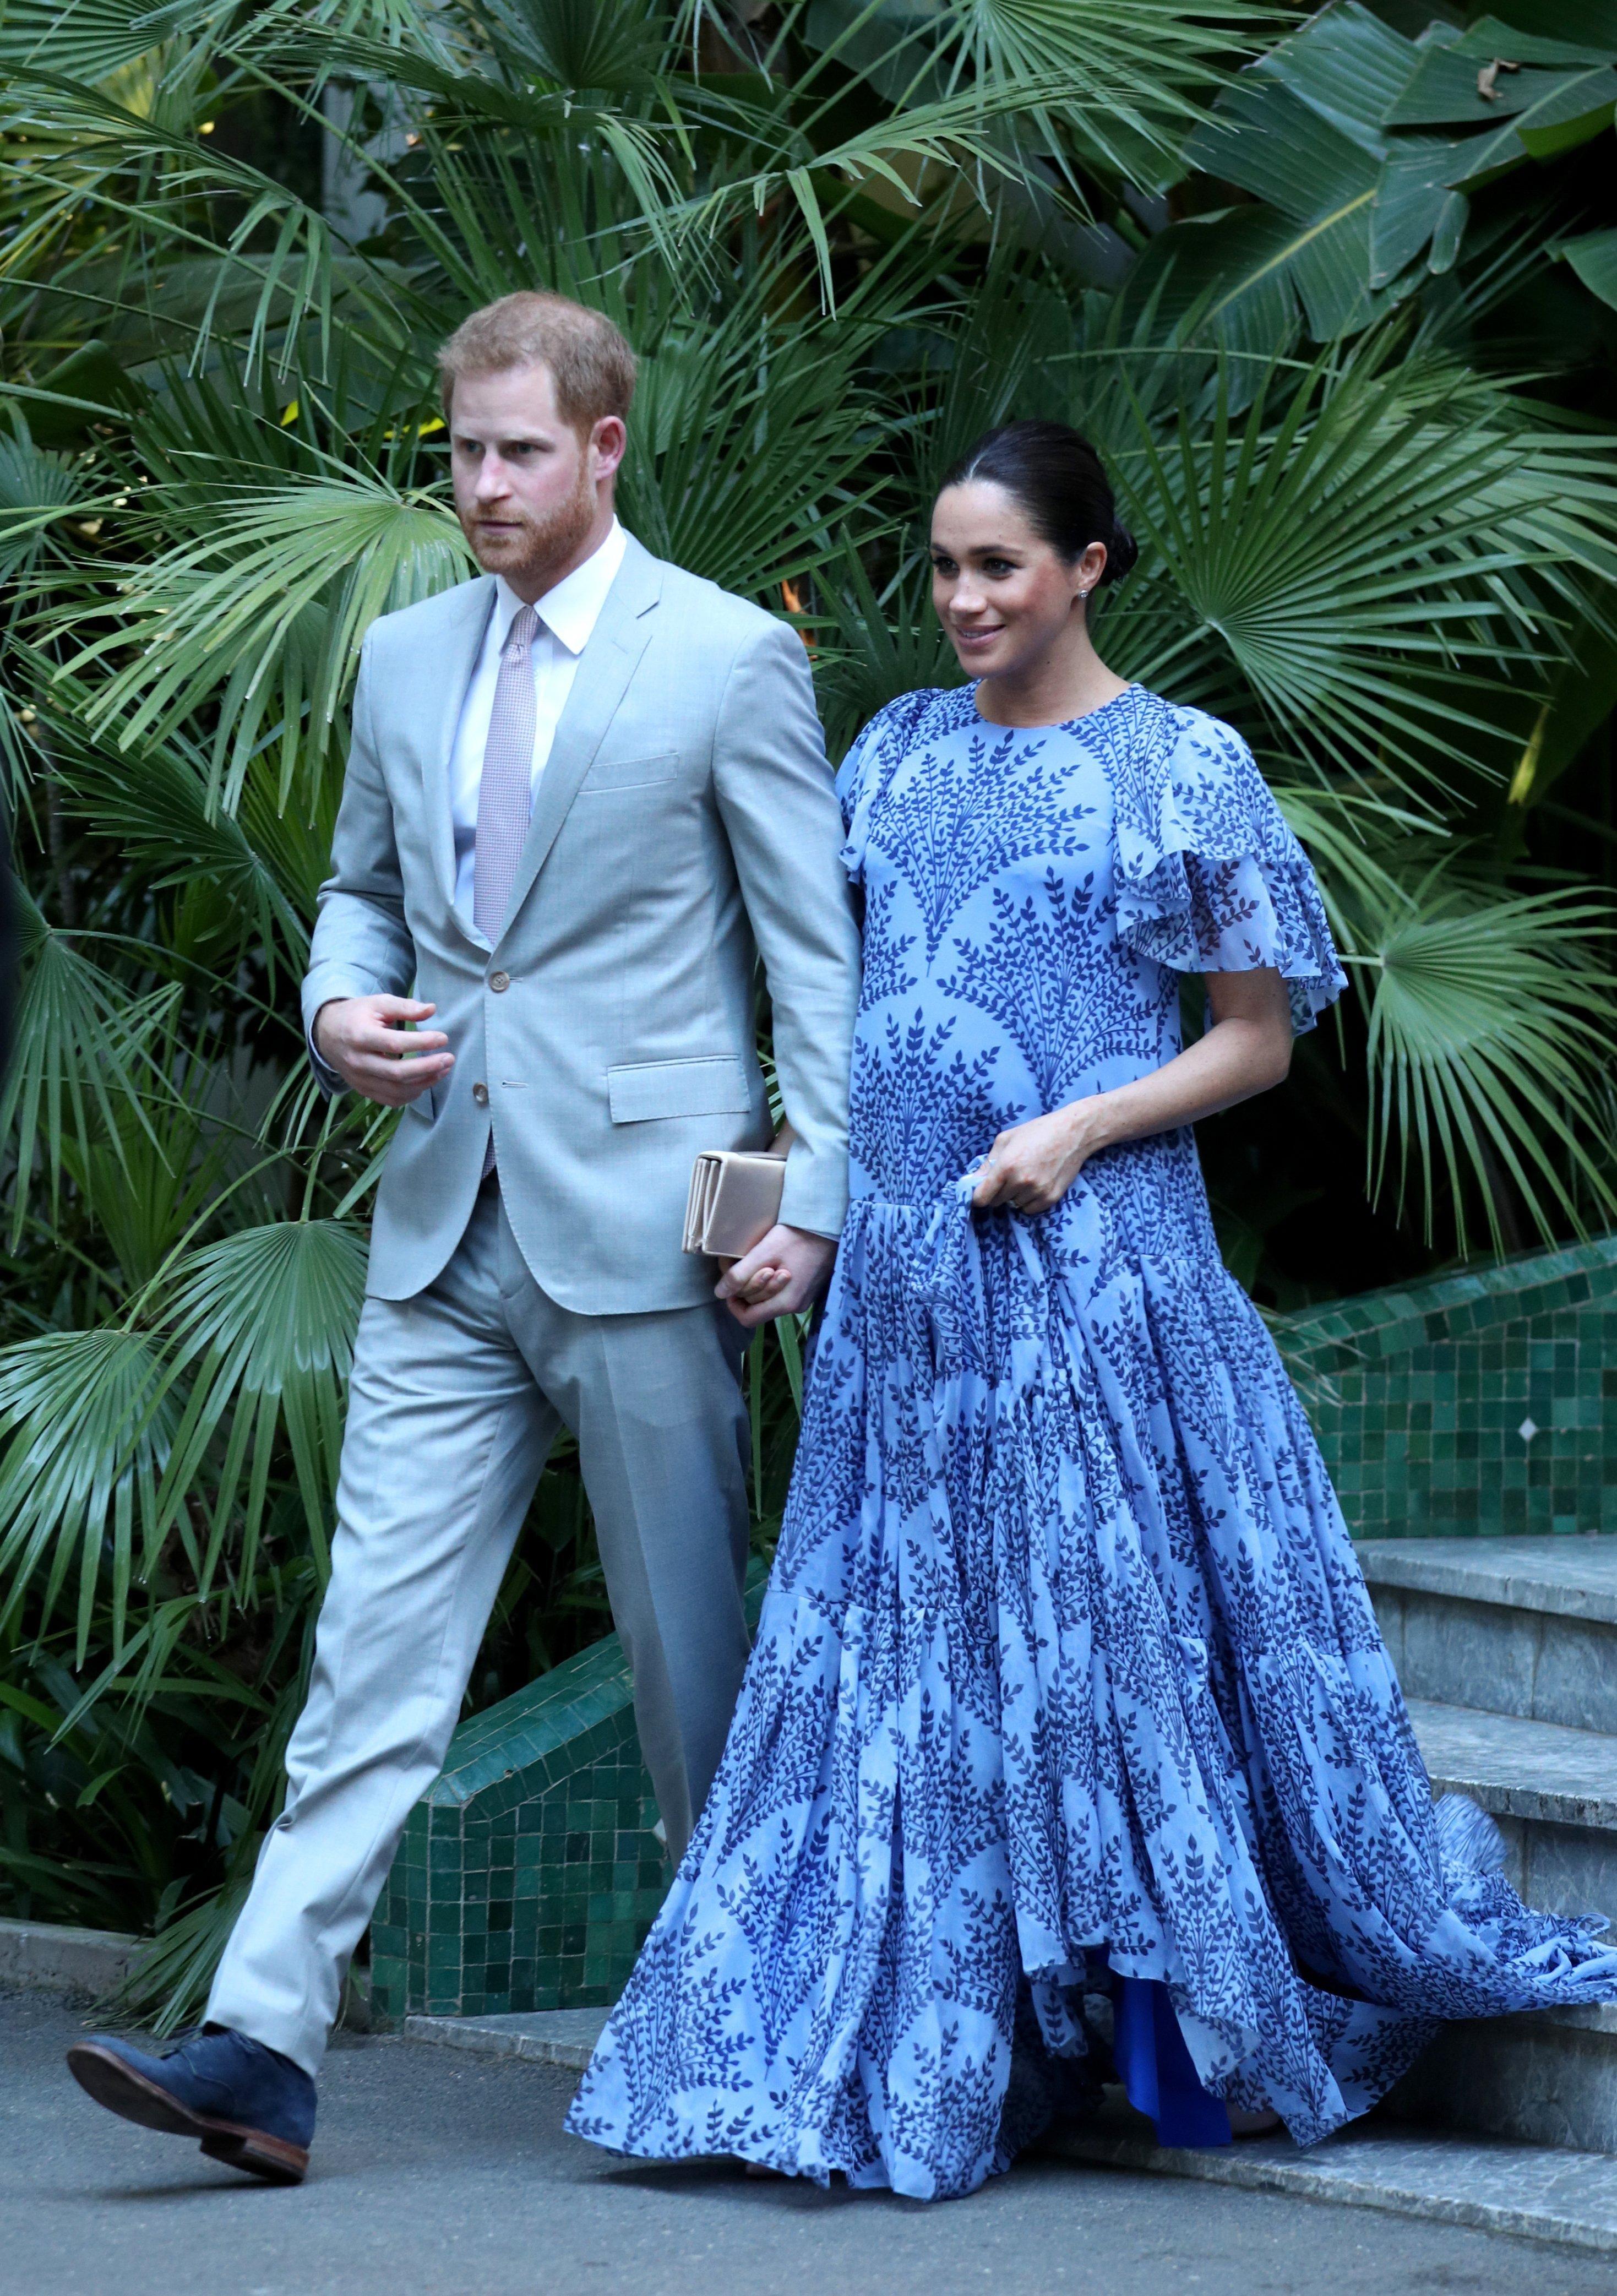 Meghan Markle und Prinz Harry, Februar 2019 | Quelle: Getty Images